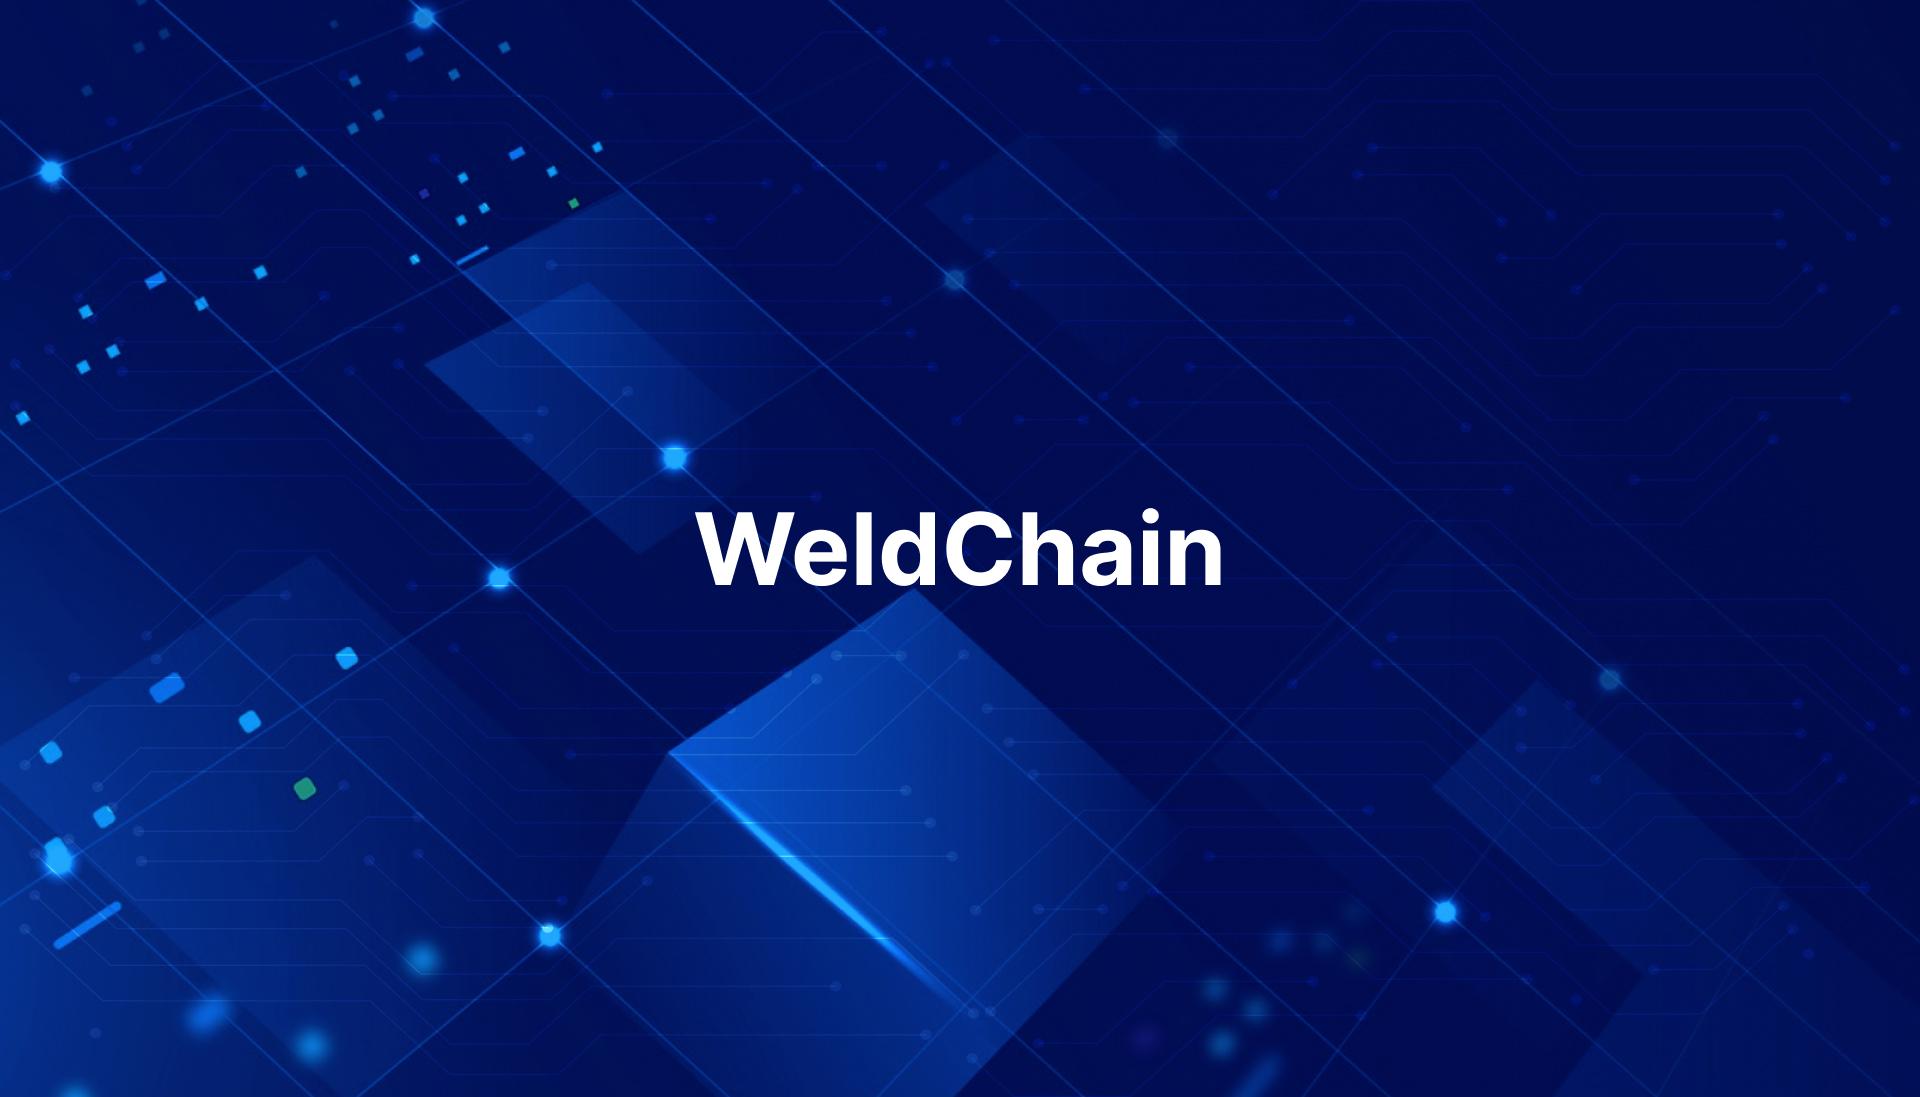 WeldChain